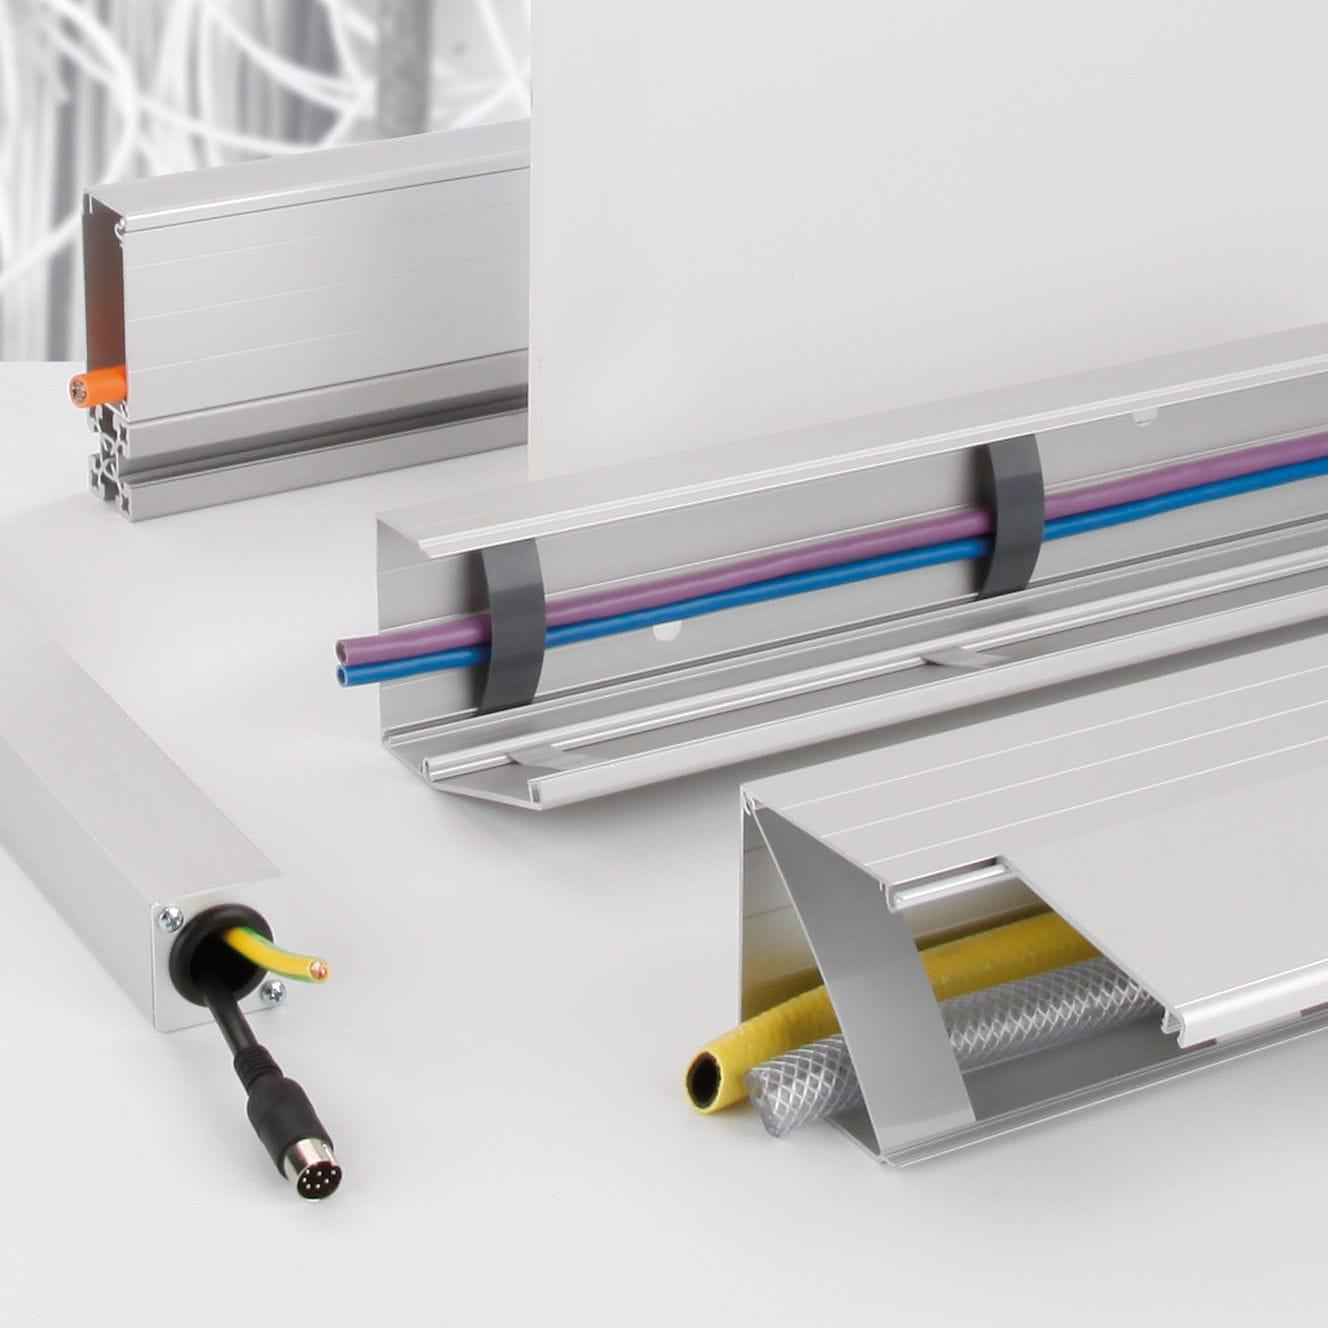 Charmant Wiremold Kabelkanal System Ideen - Elektrische Schaltplan ...